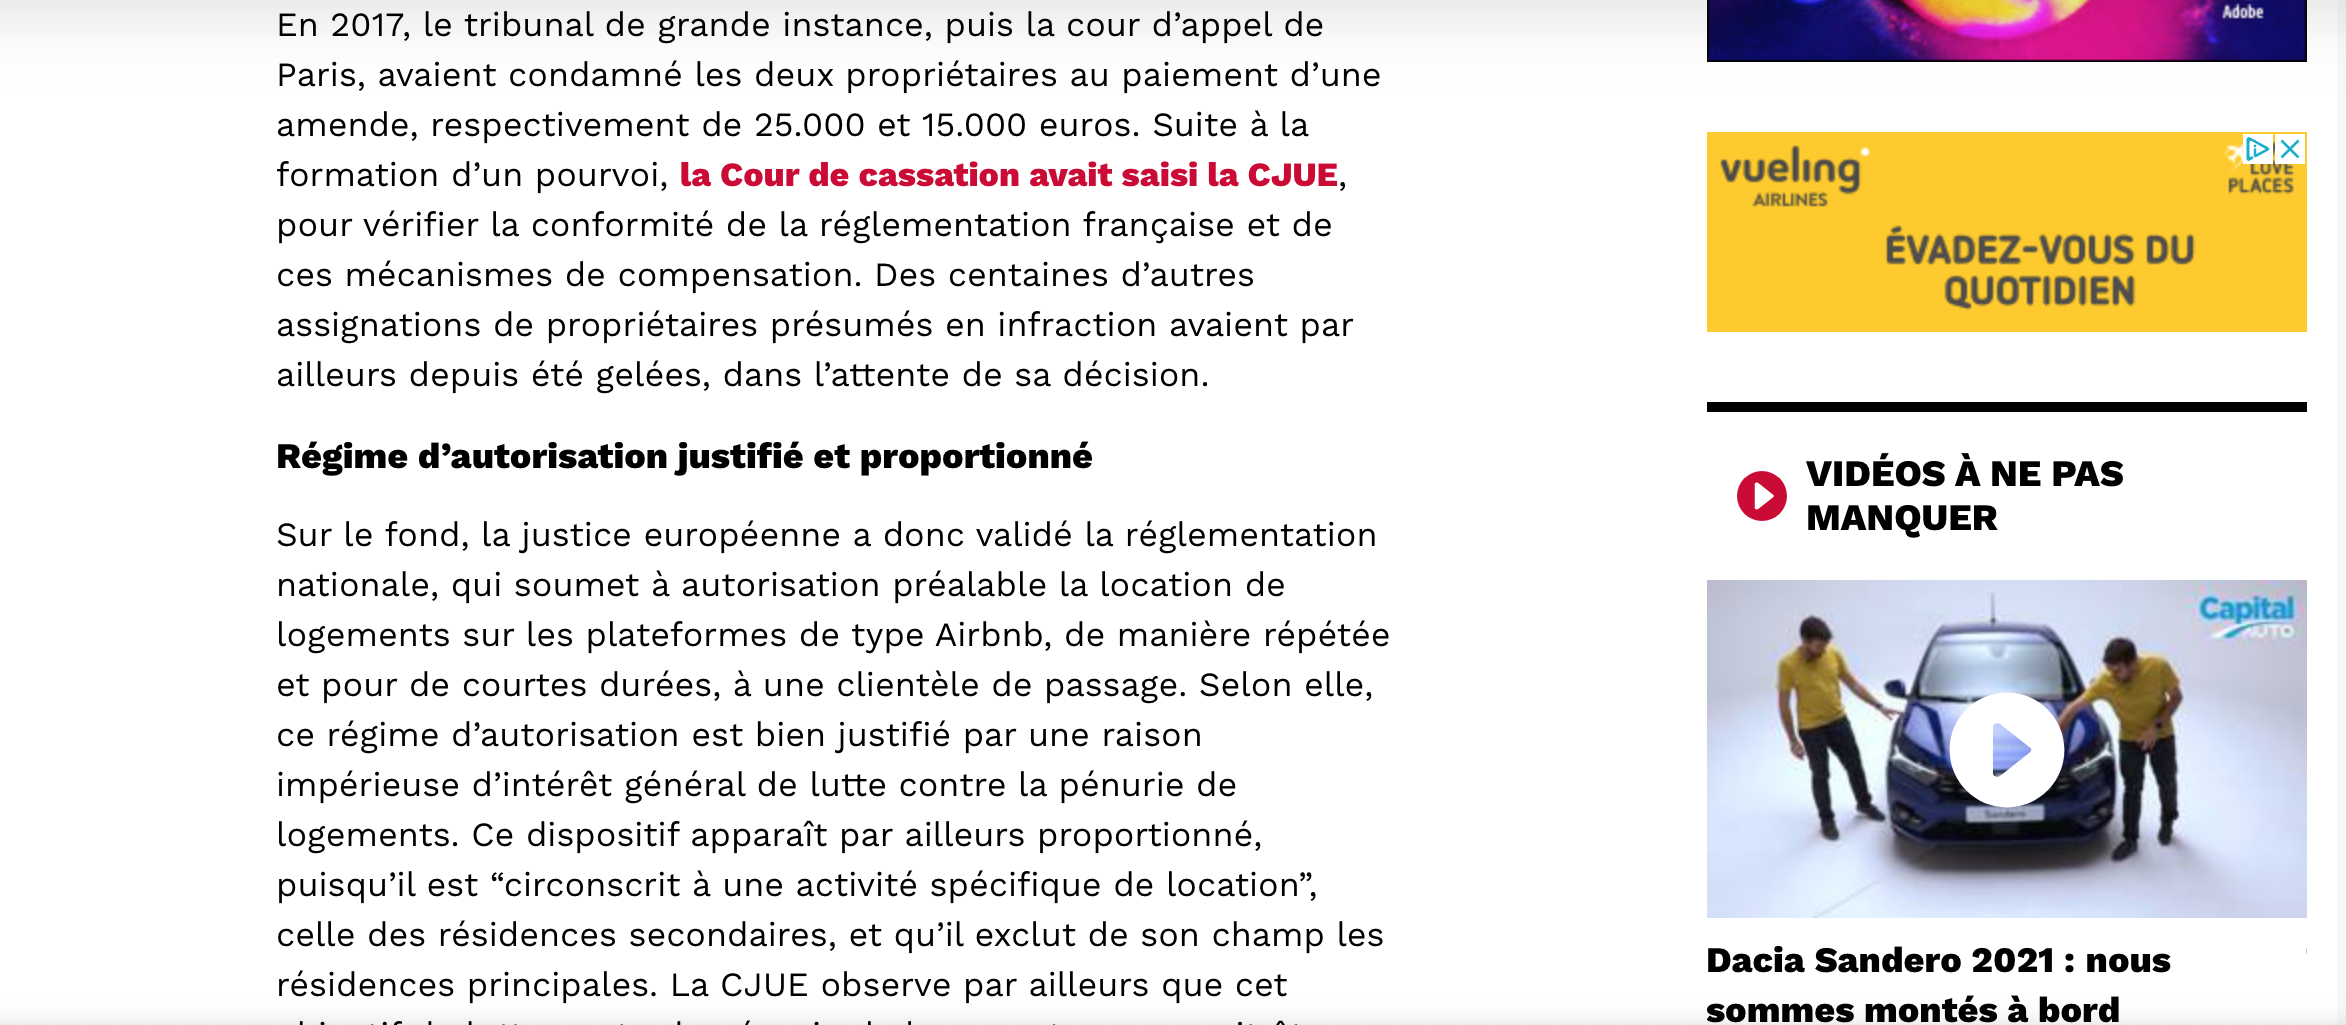 Capital airbnb CJUE